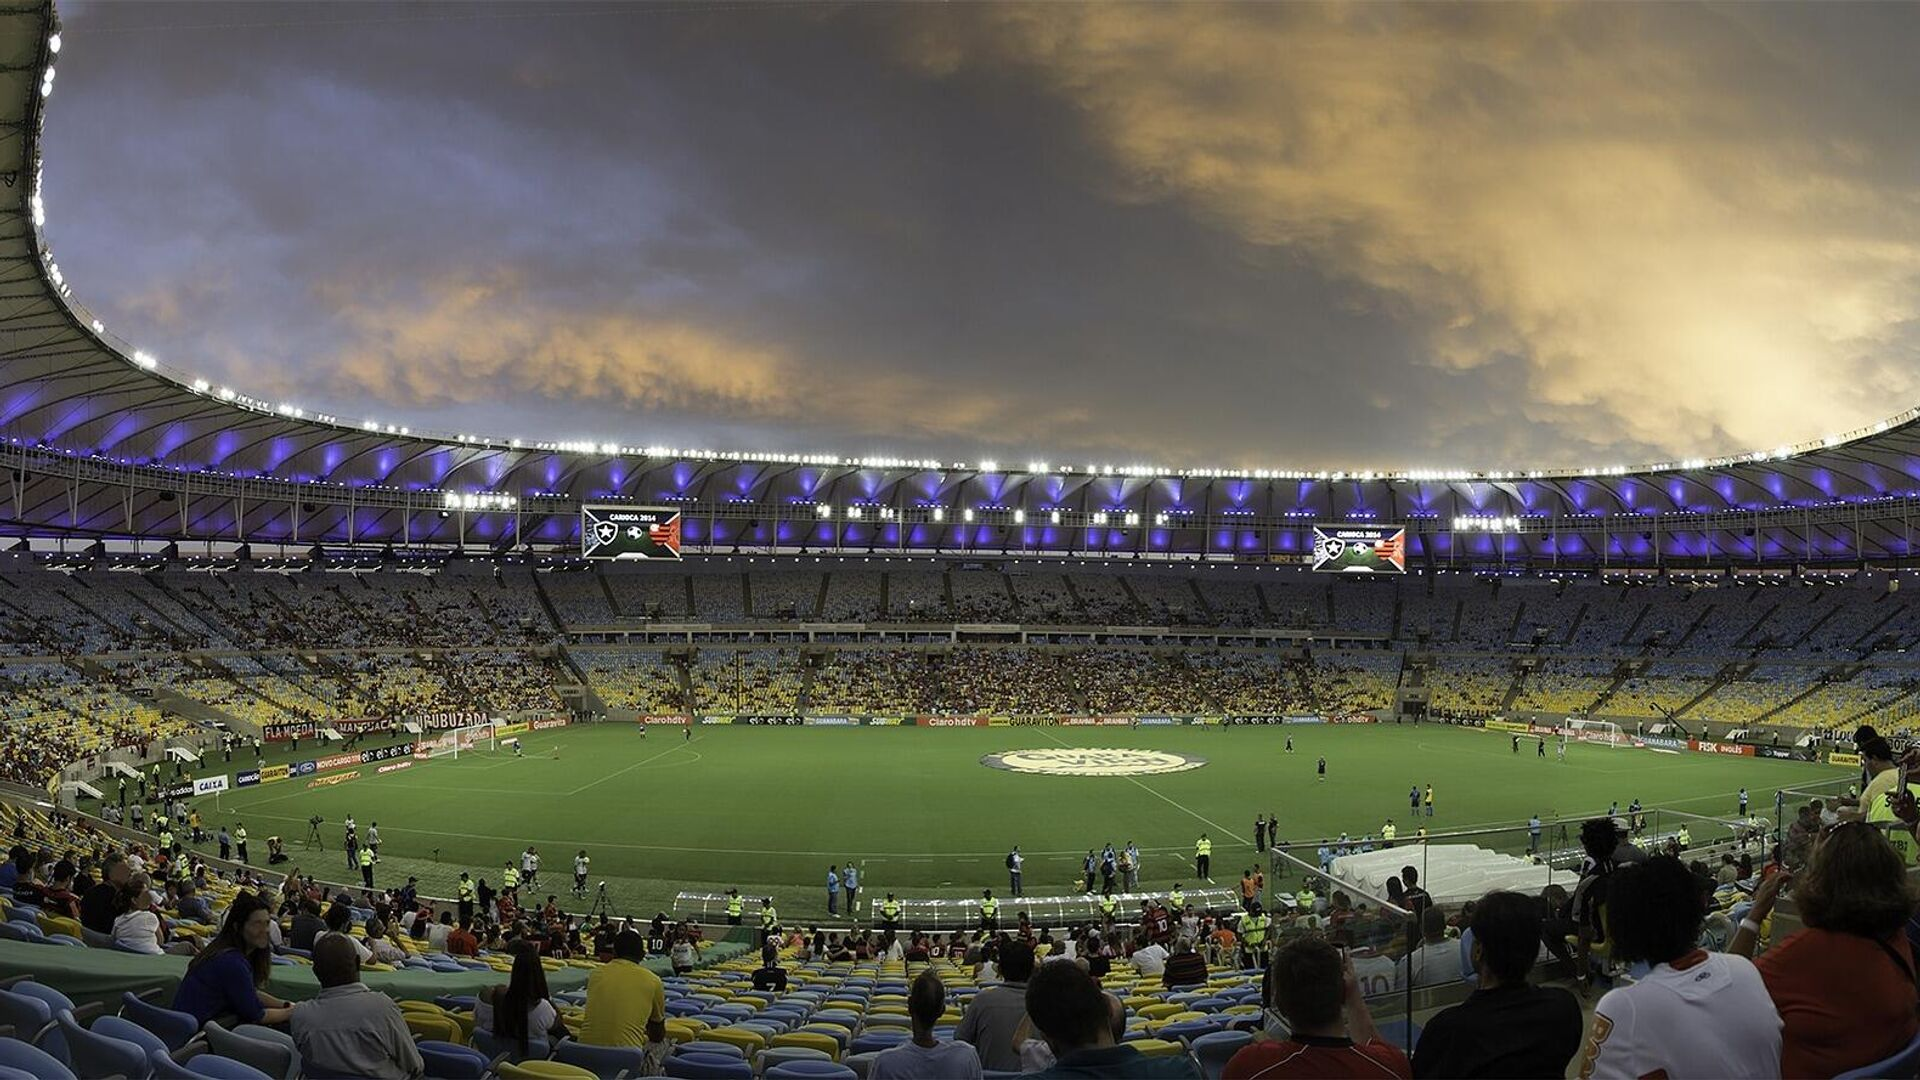 Стадион Маракана - РИА Новости, 1920, 07.04.2021